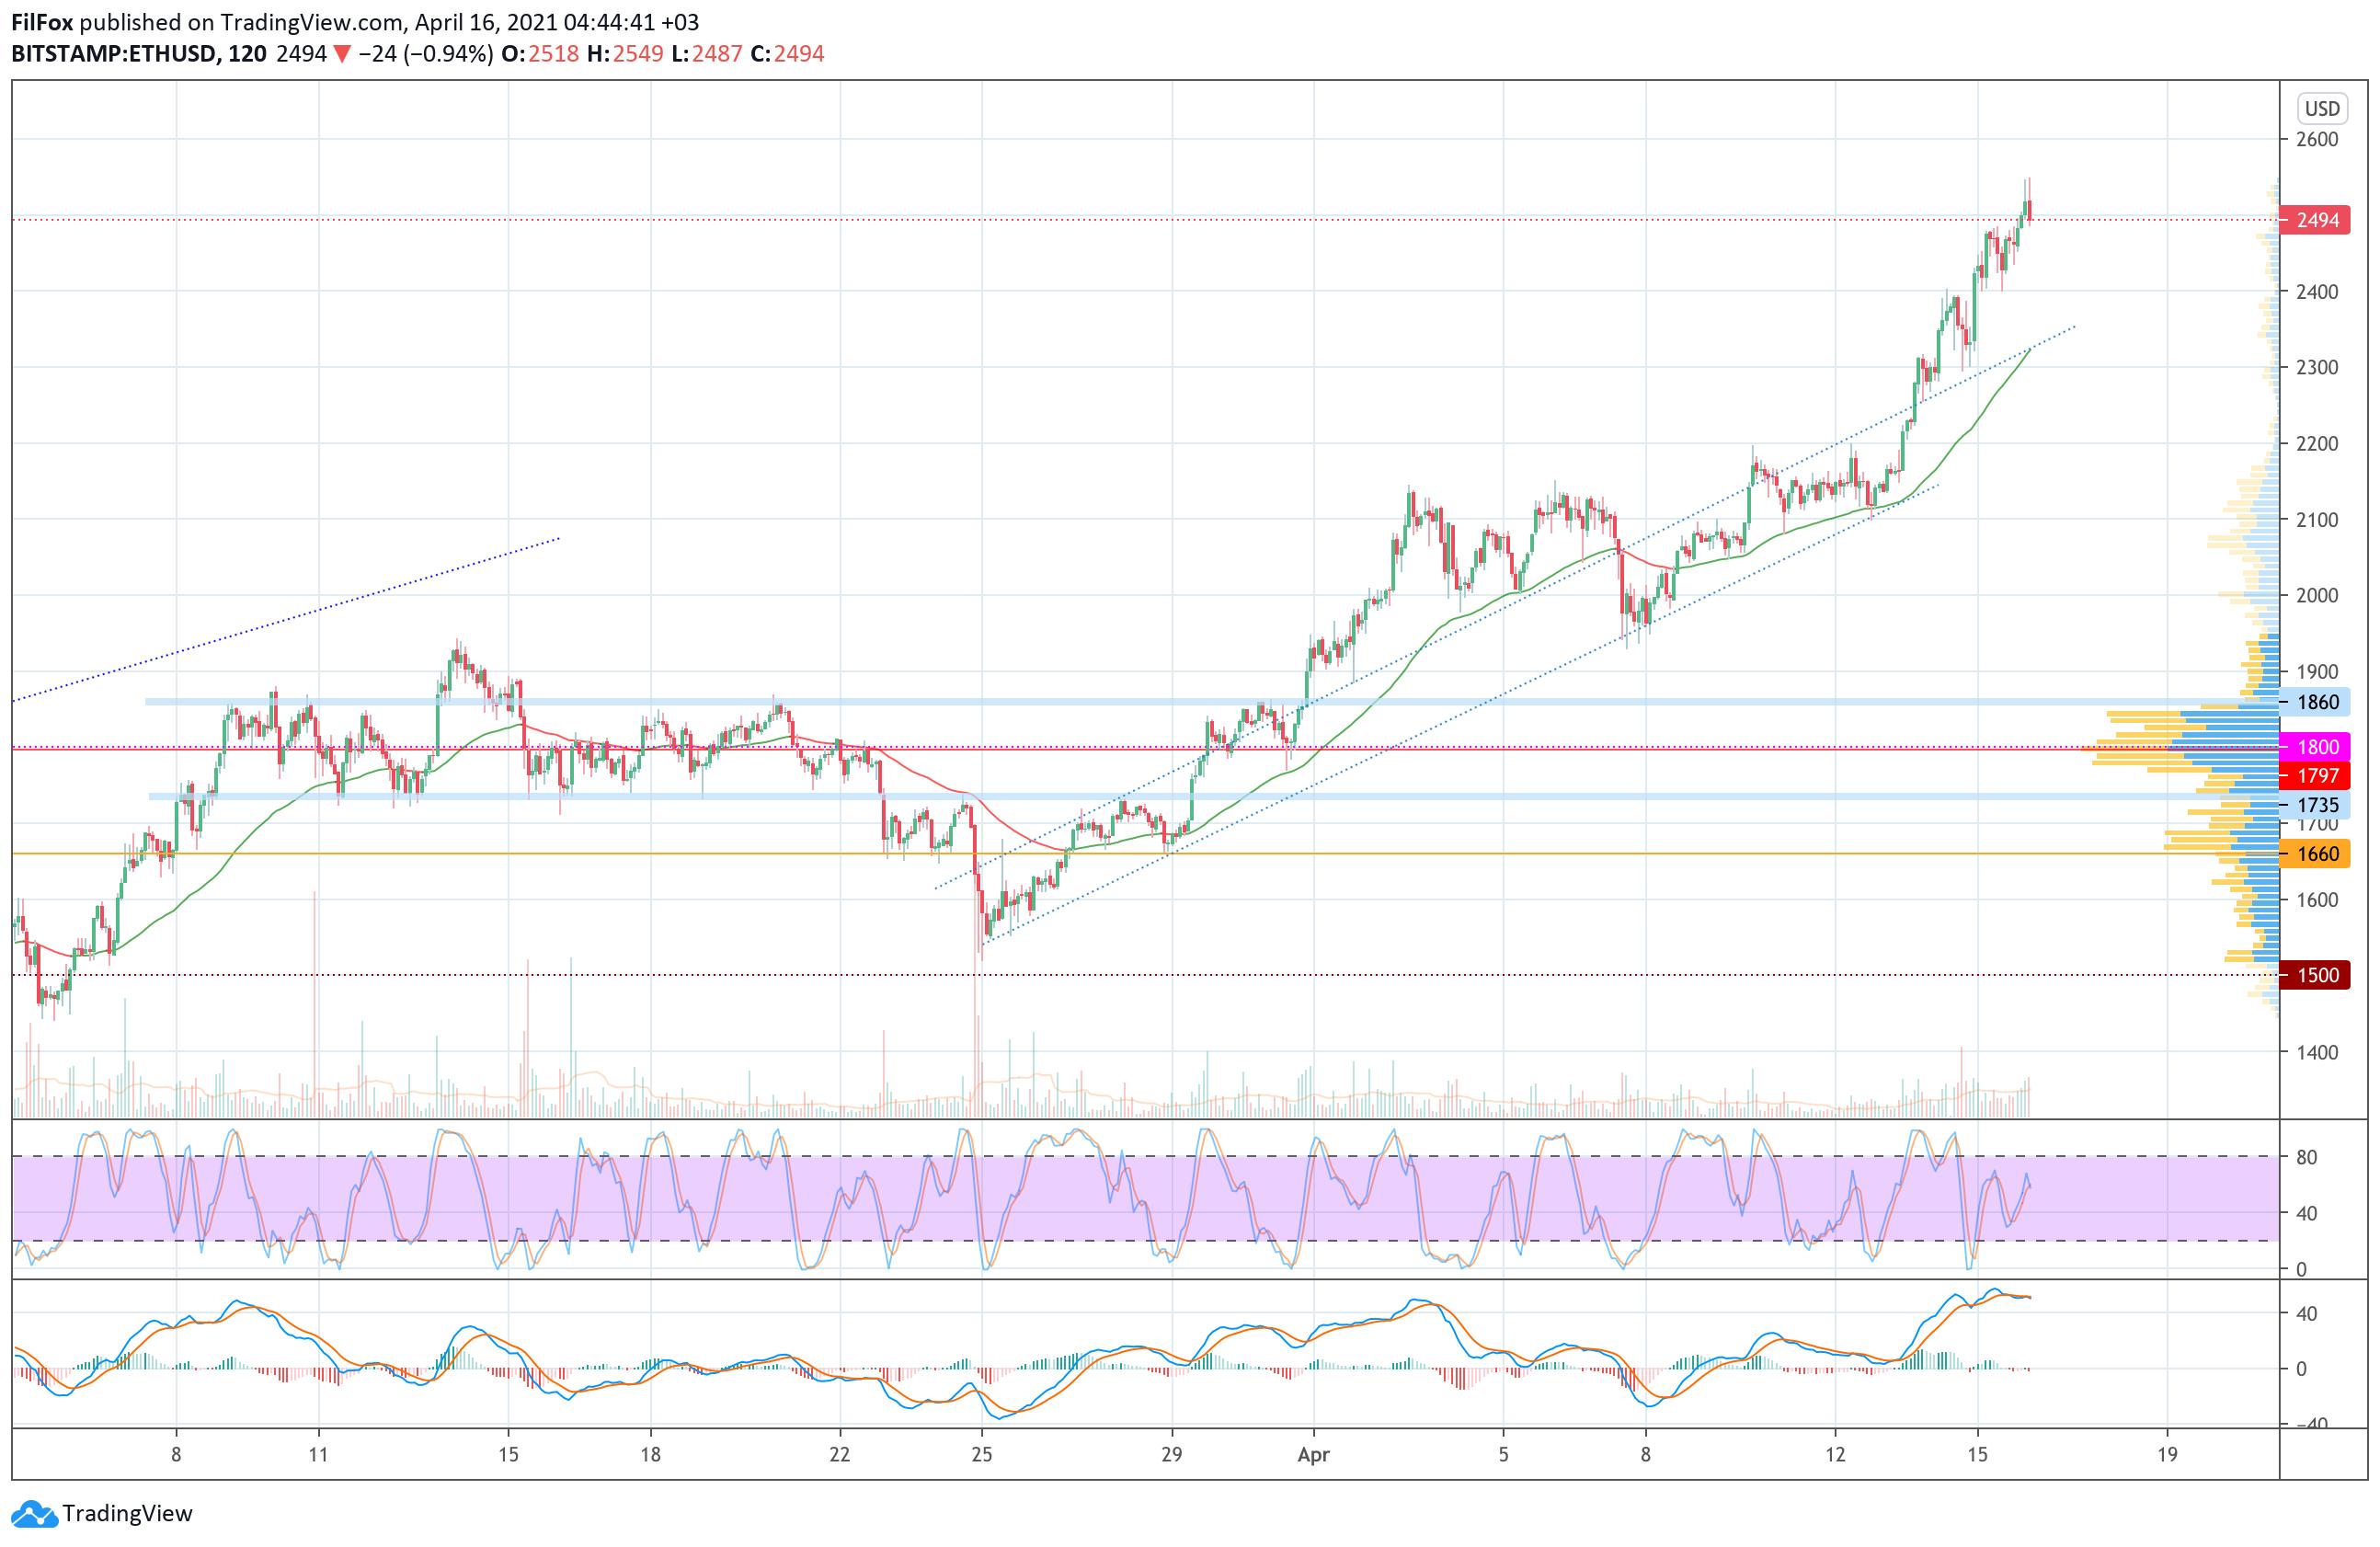 006704 - Анализ цен Bitcoin, Ethereum, XRP на 16.04.2021